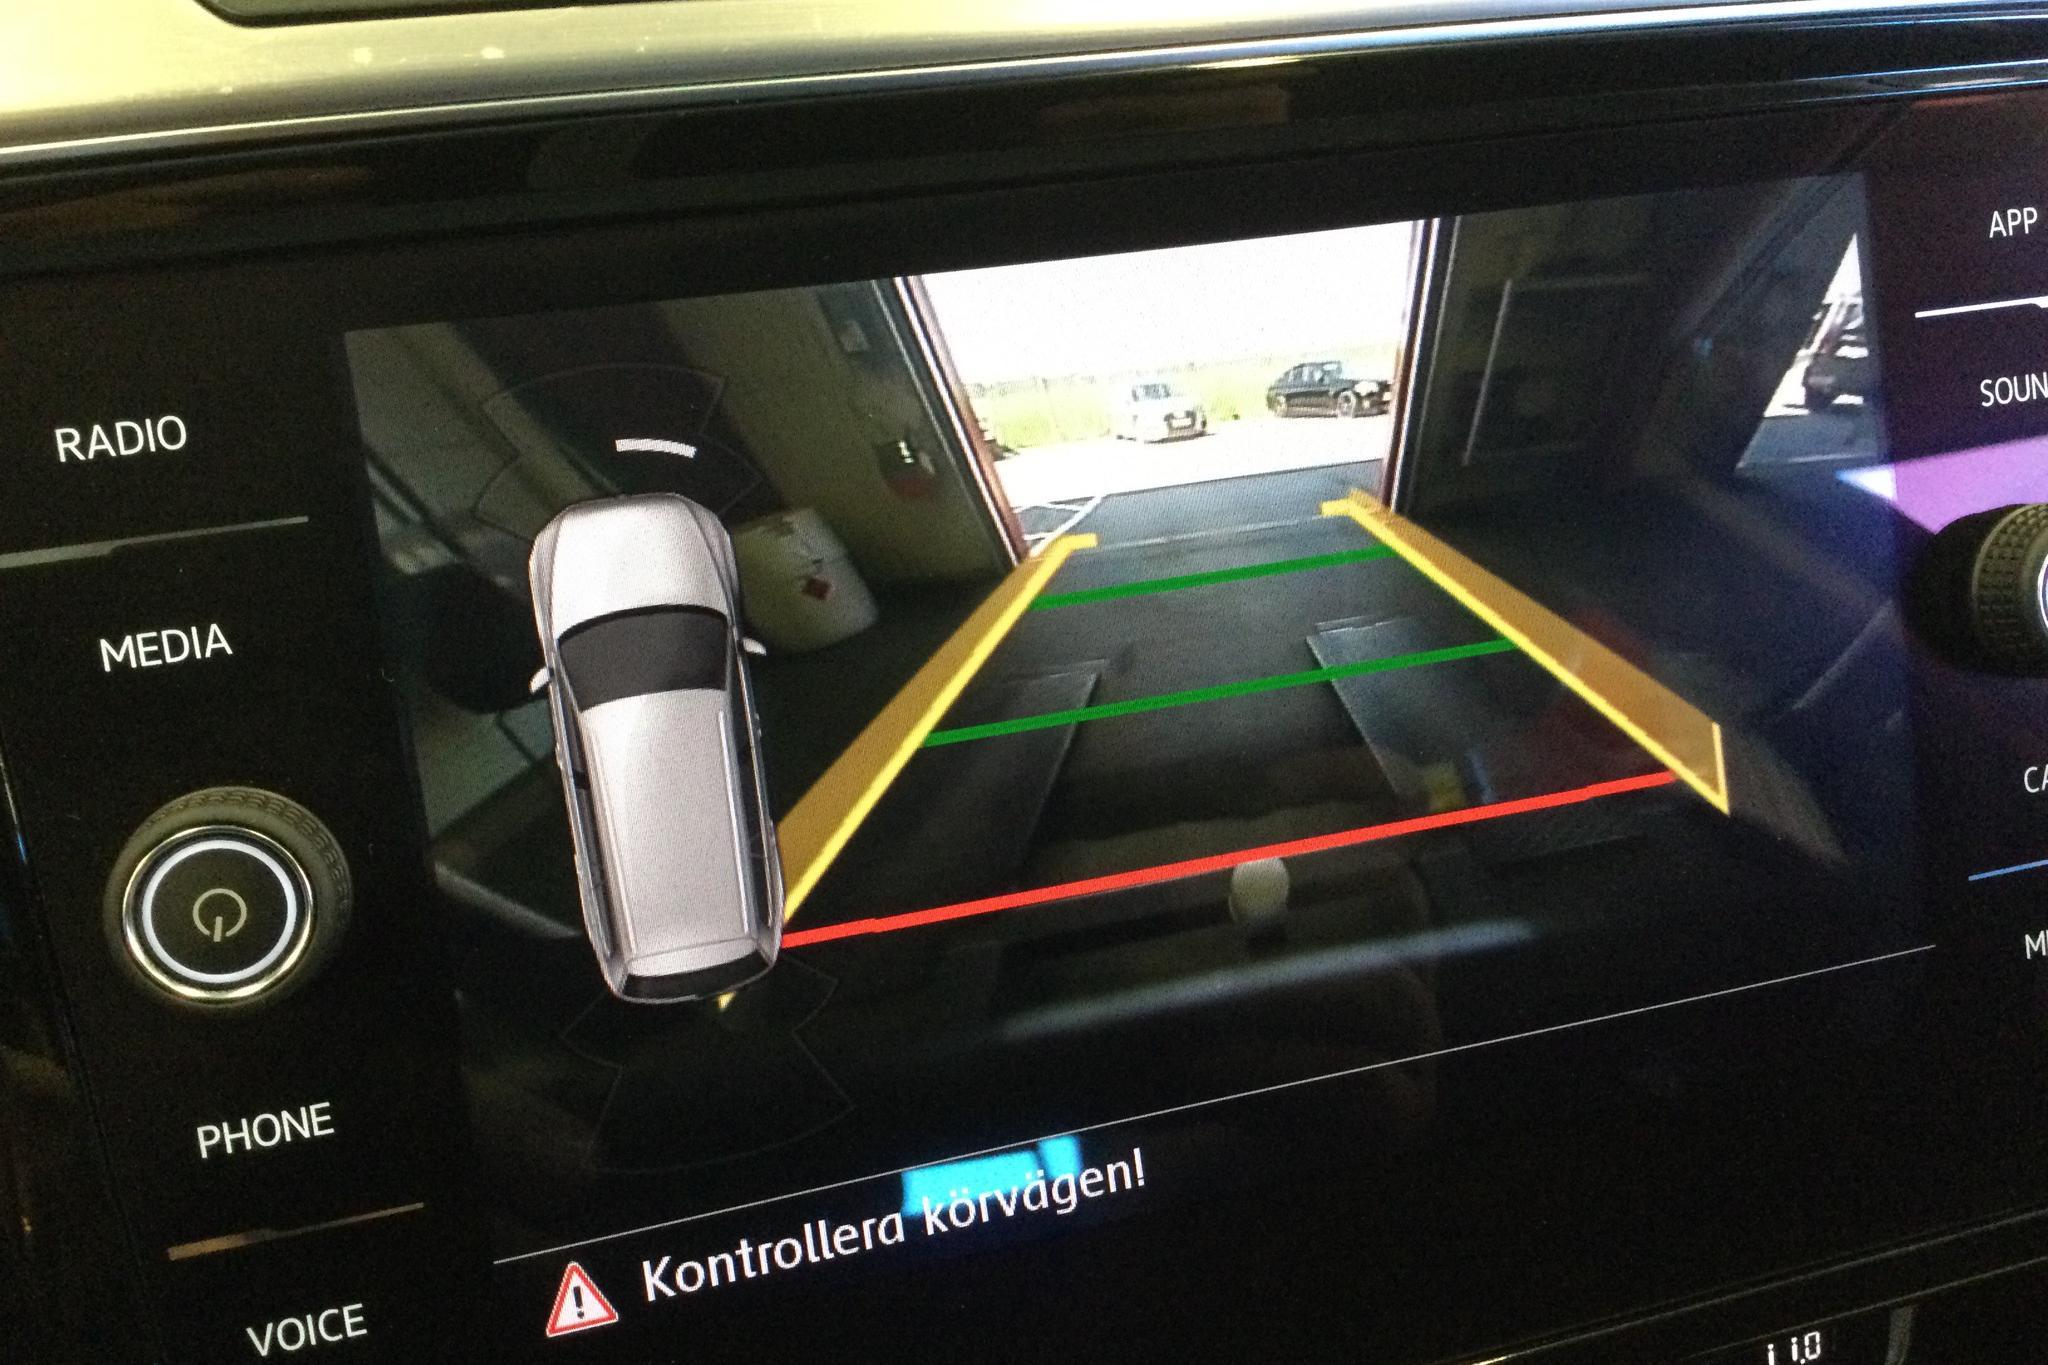 VW Passat 2.0 TDI Sportscombi (190hk) - 12 490 mil - Automat - Dark Grey - 2018